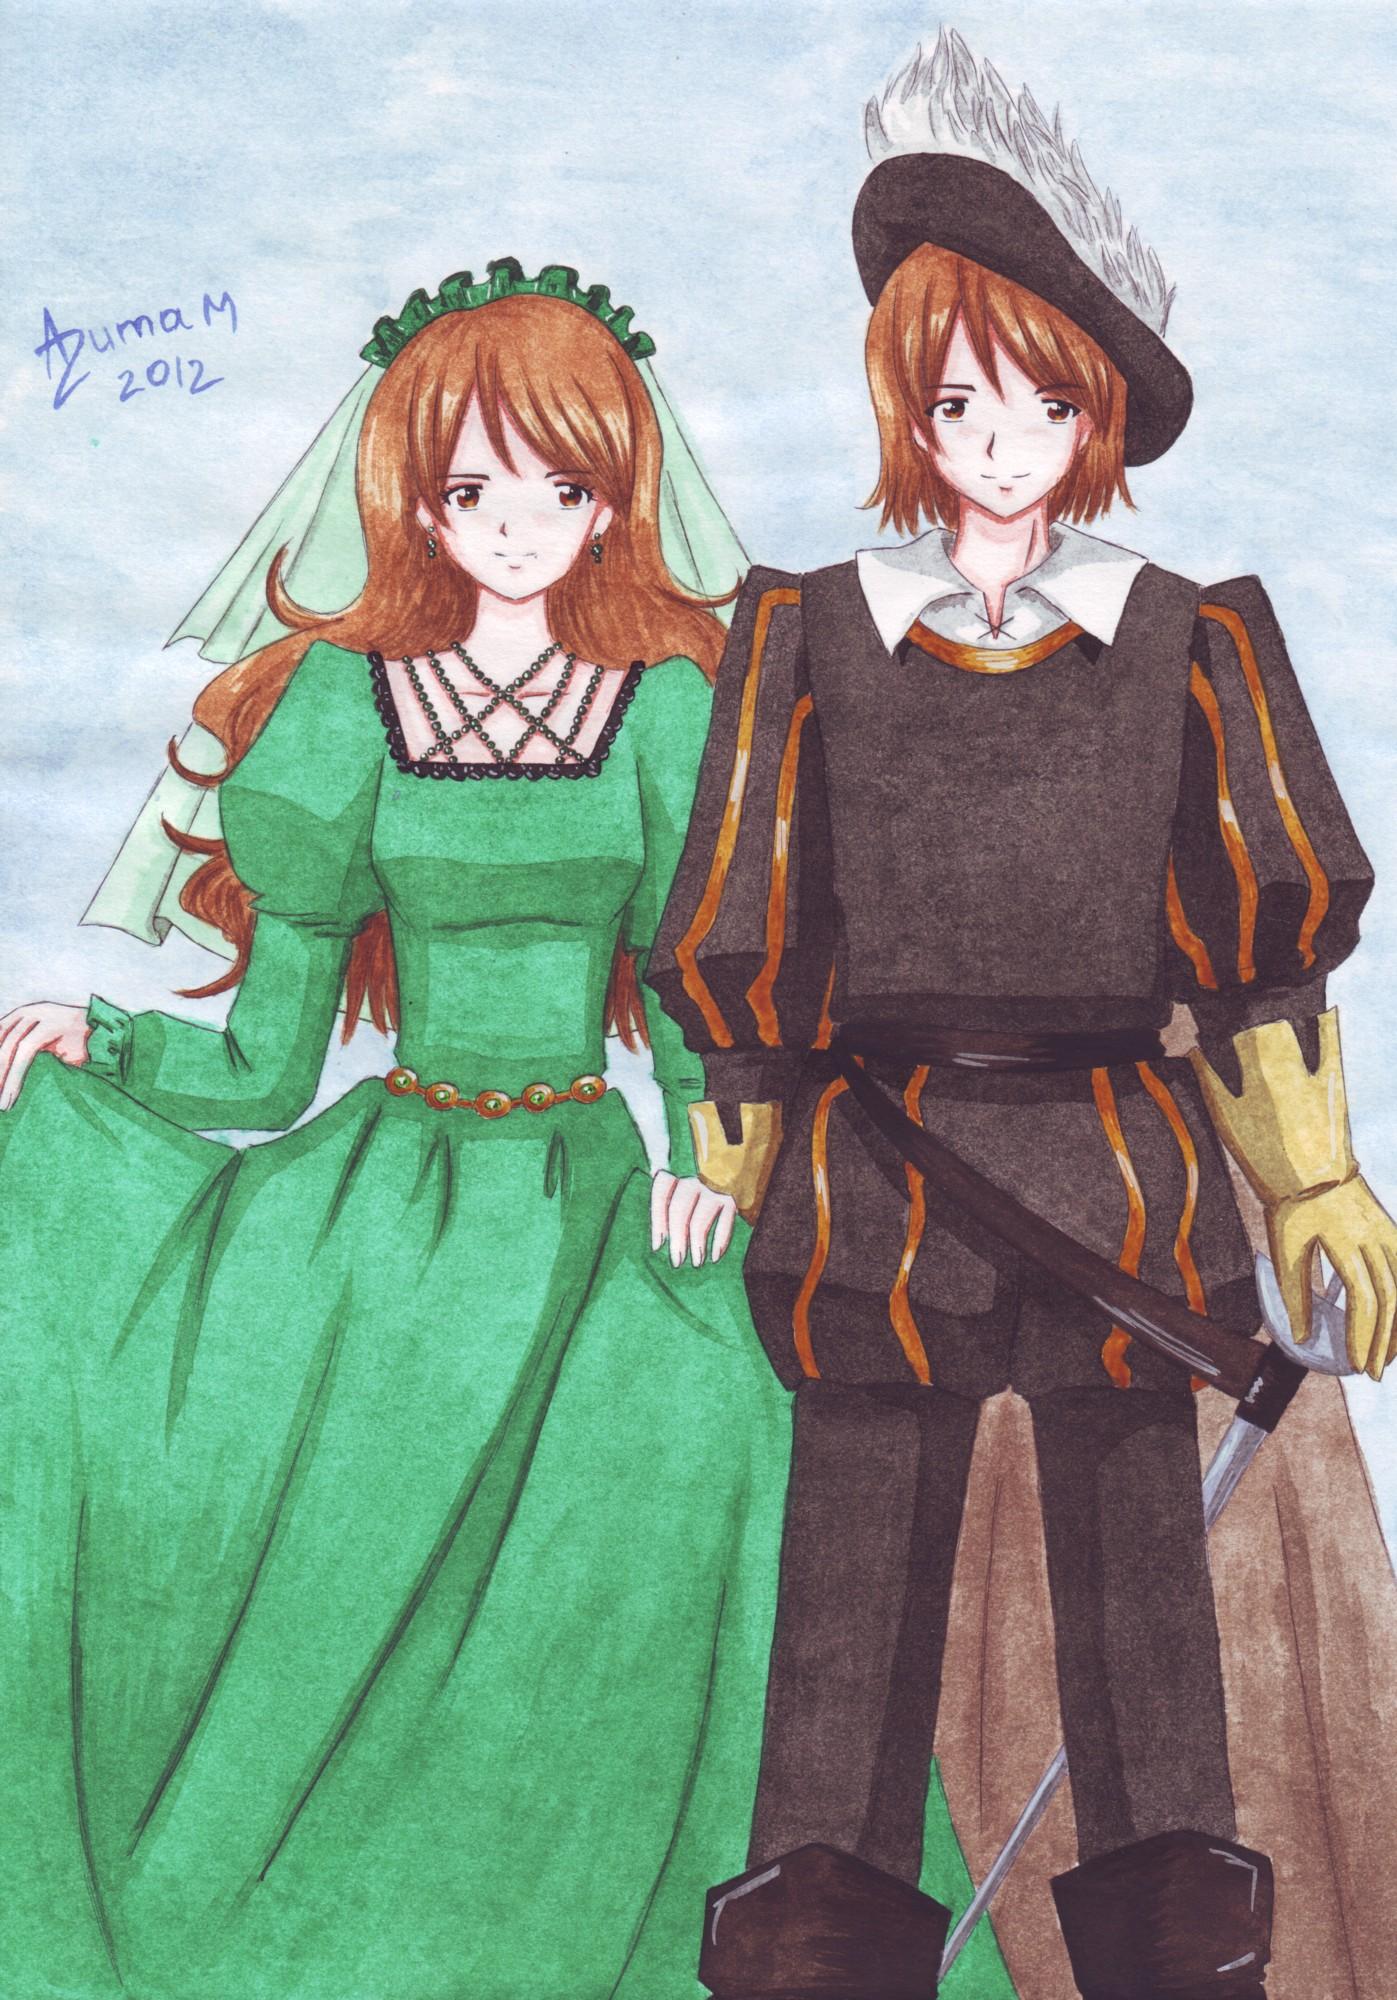 Twelfth night: Sebastian and Viola